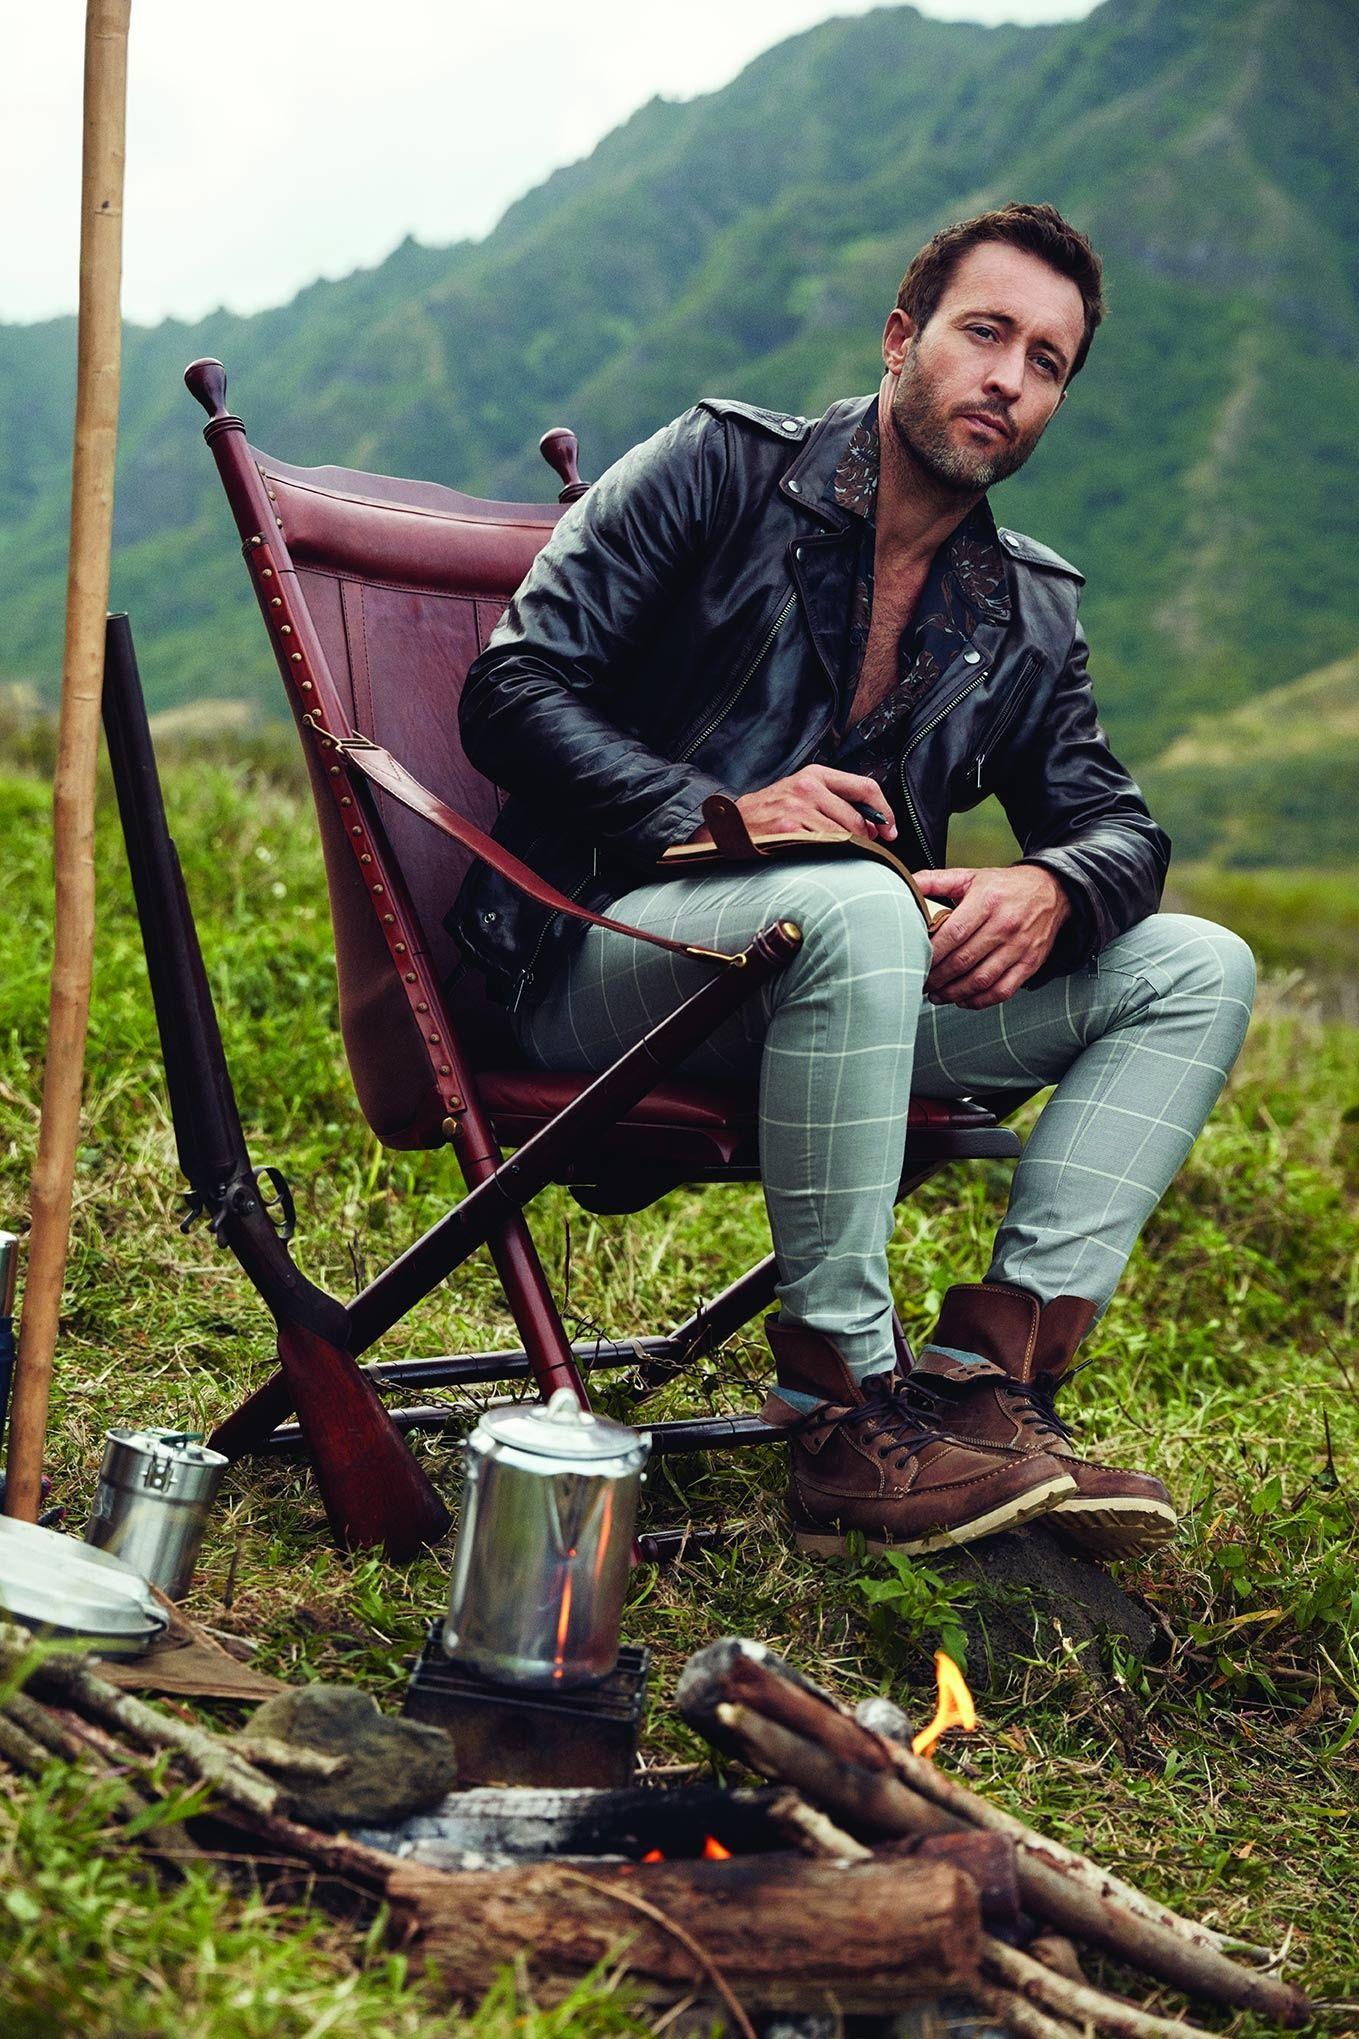 Alex O\u2019Loughlin wearing plaid pants and boots